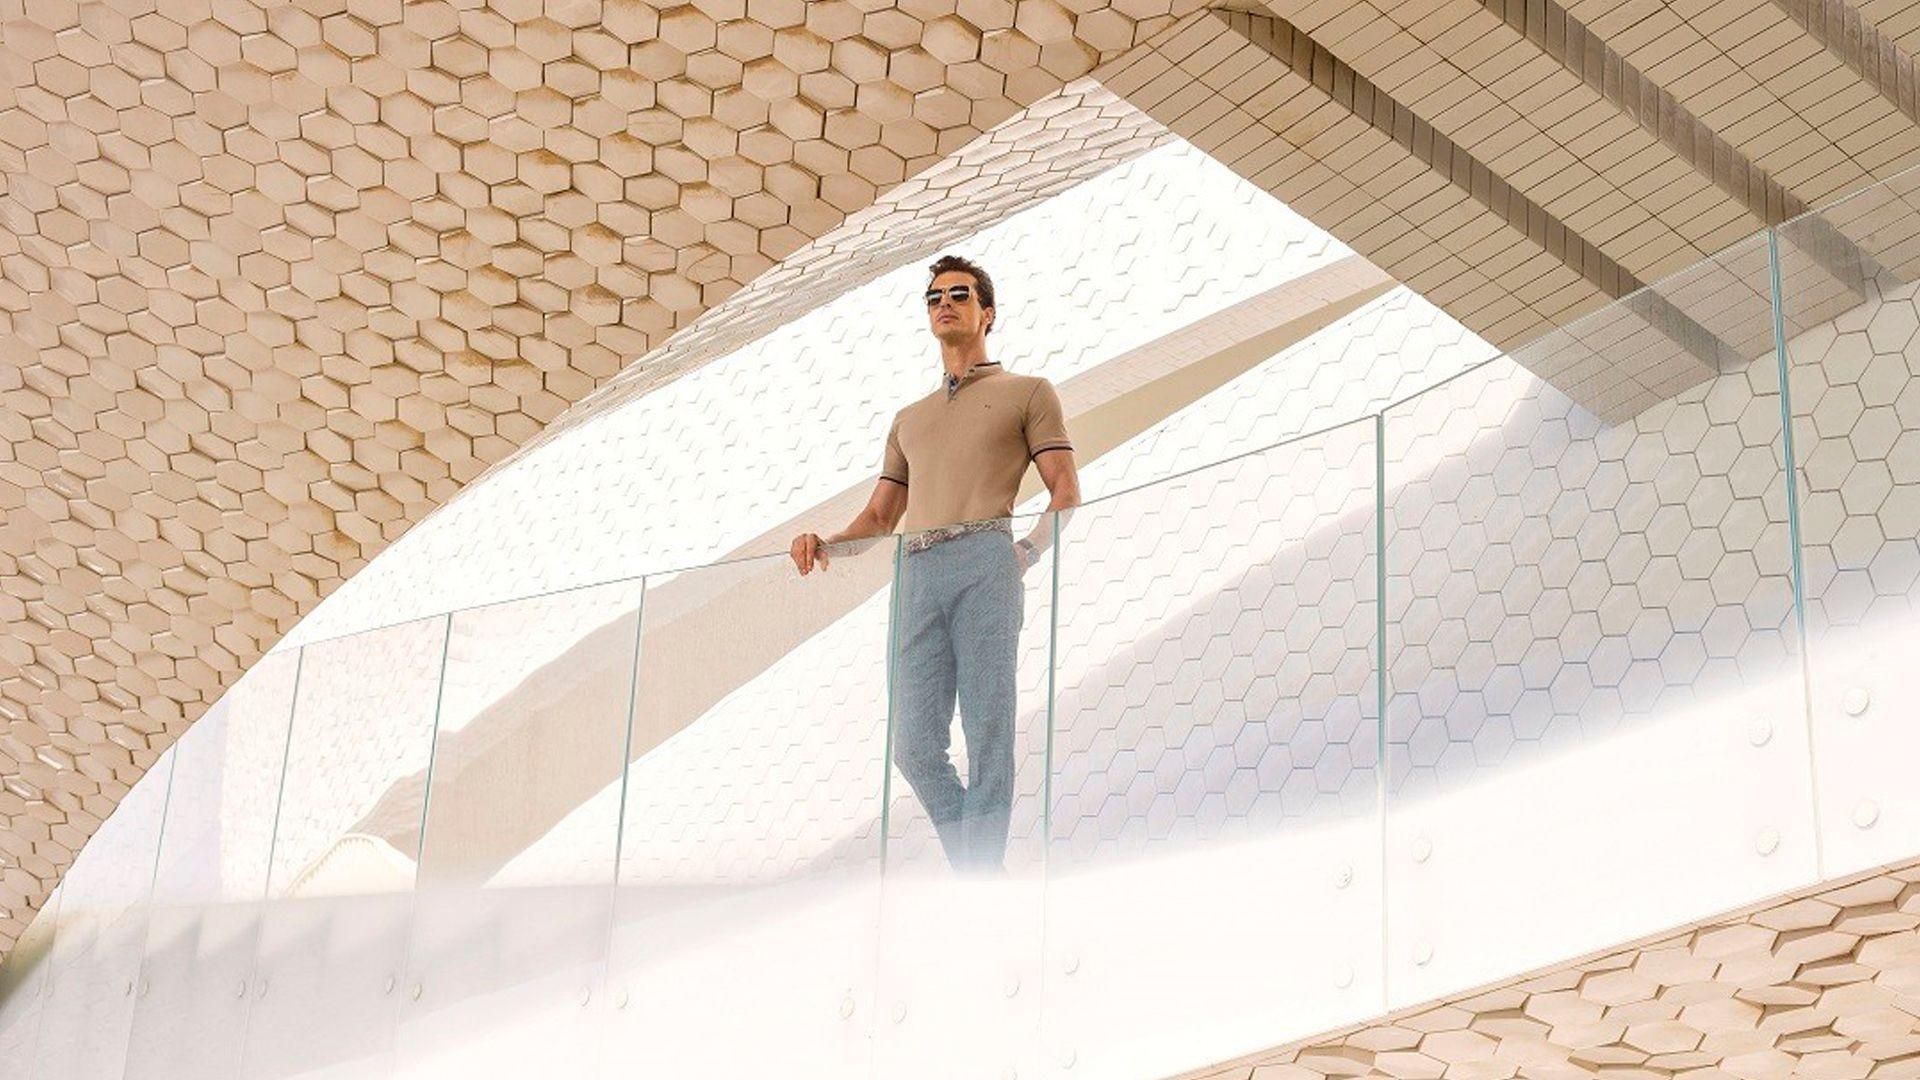 Tienda de ropa para hombre en Vélez-Málaga